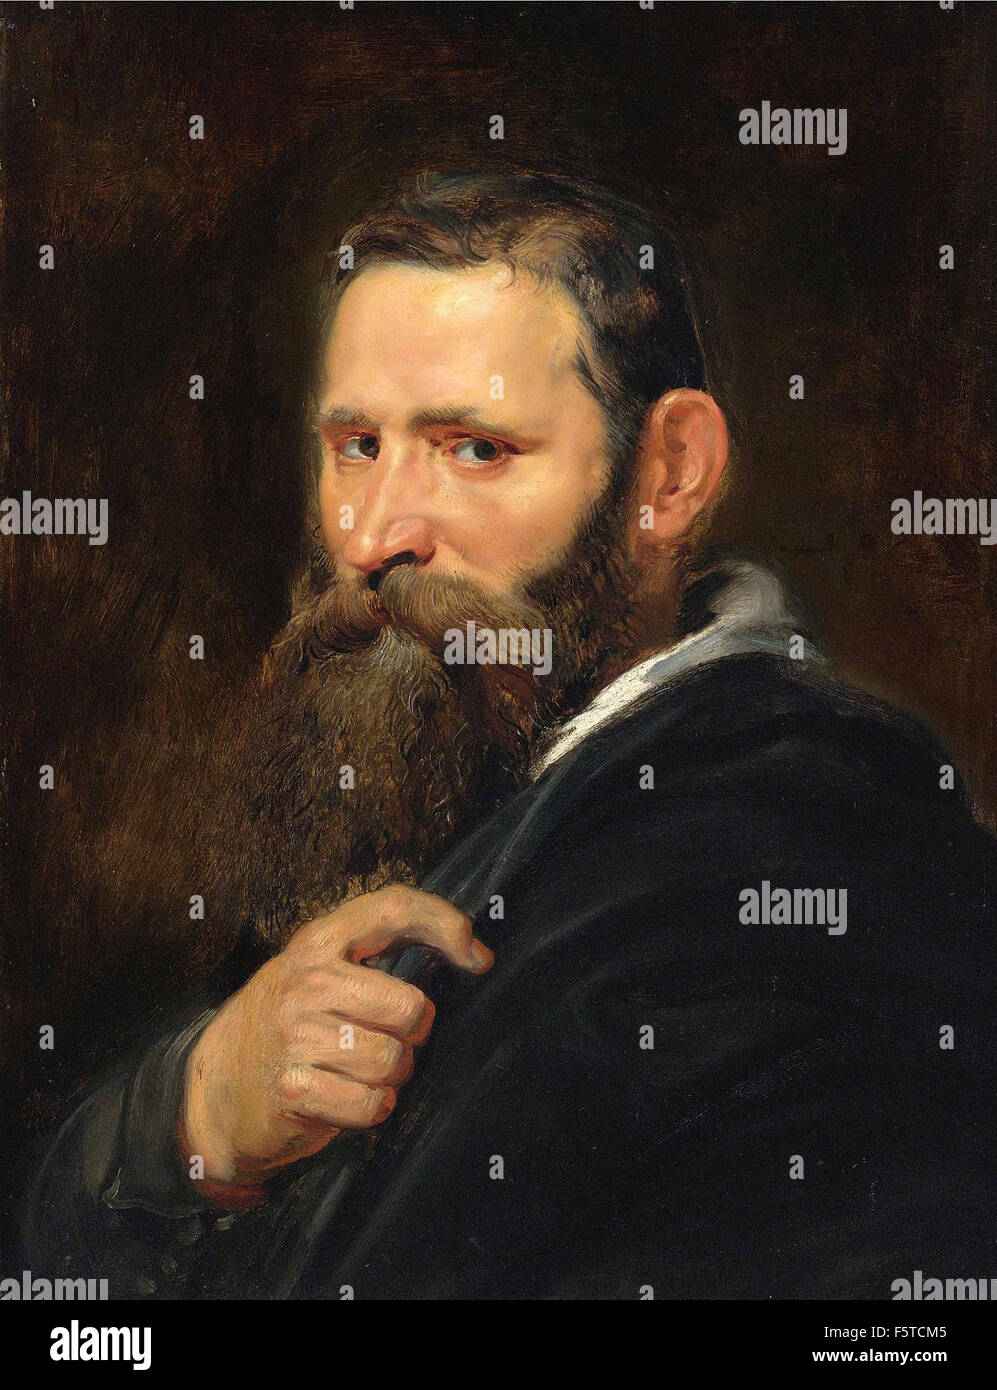 Peter Paul Rubens - Head of a Bearded Man - Stock Image